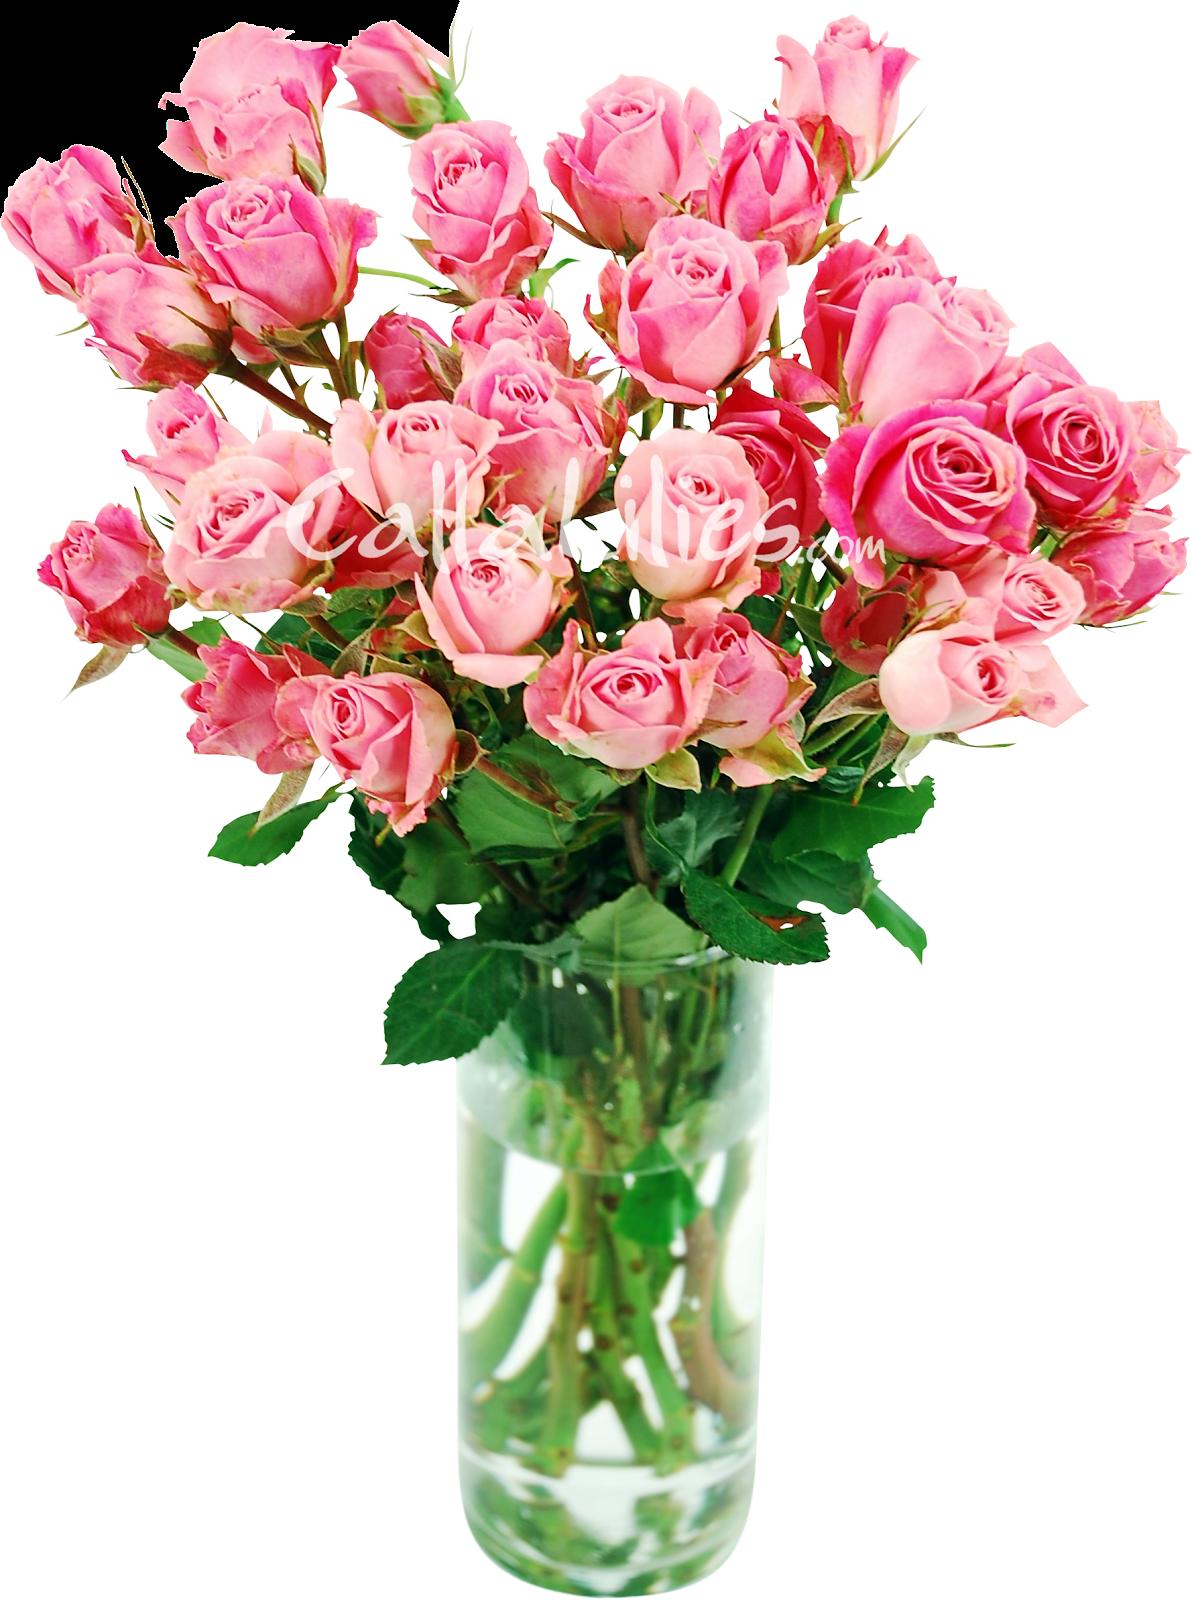 Flowers In A Vase Beautiful Flowers